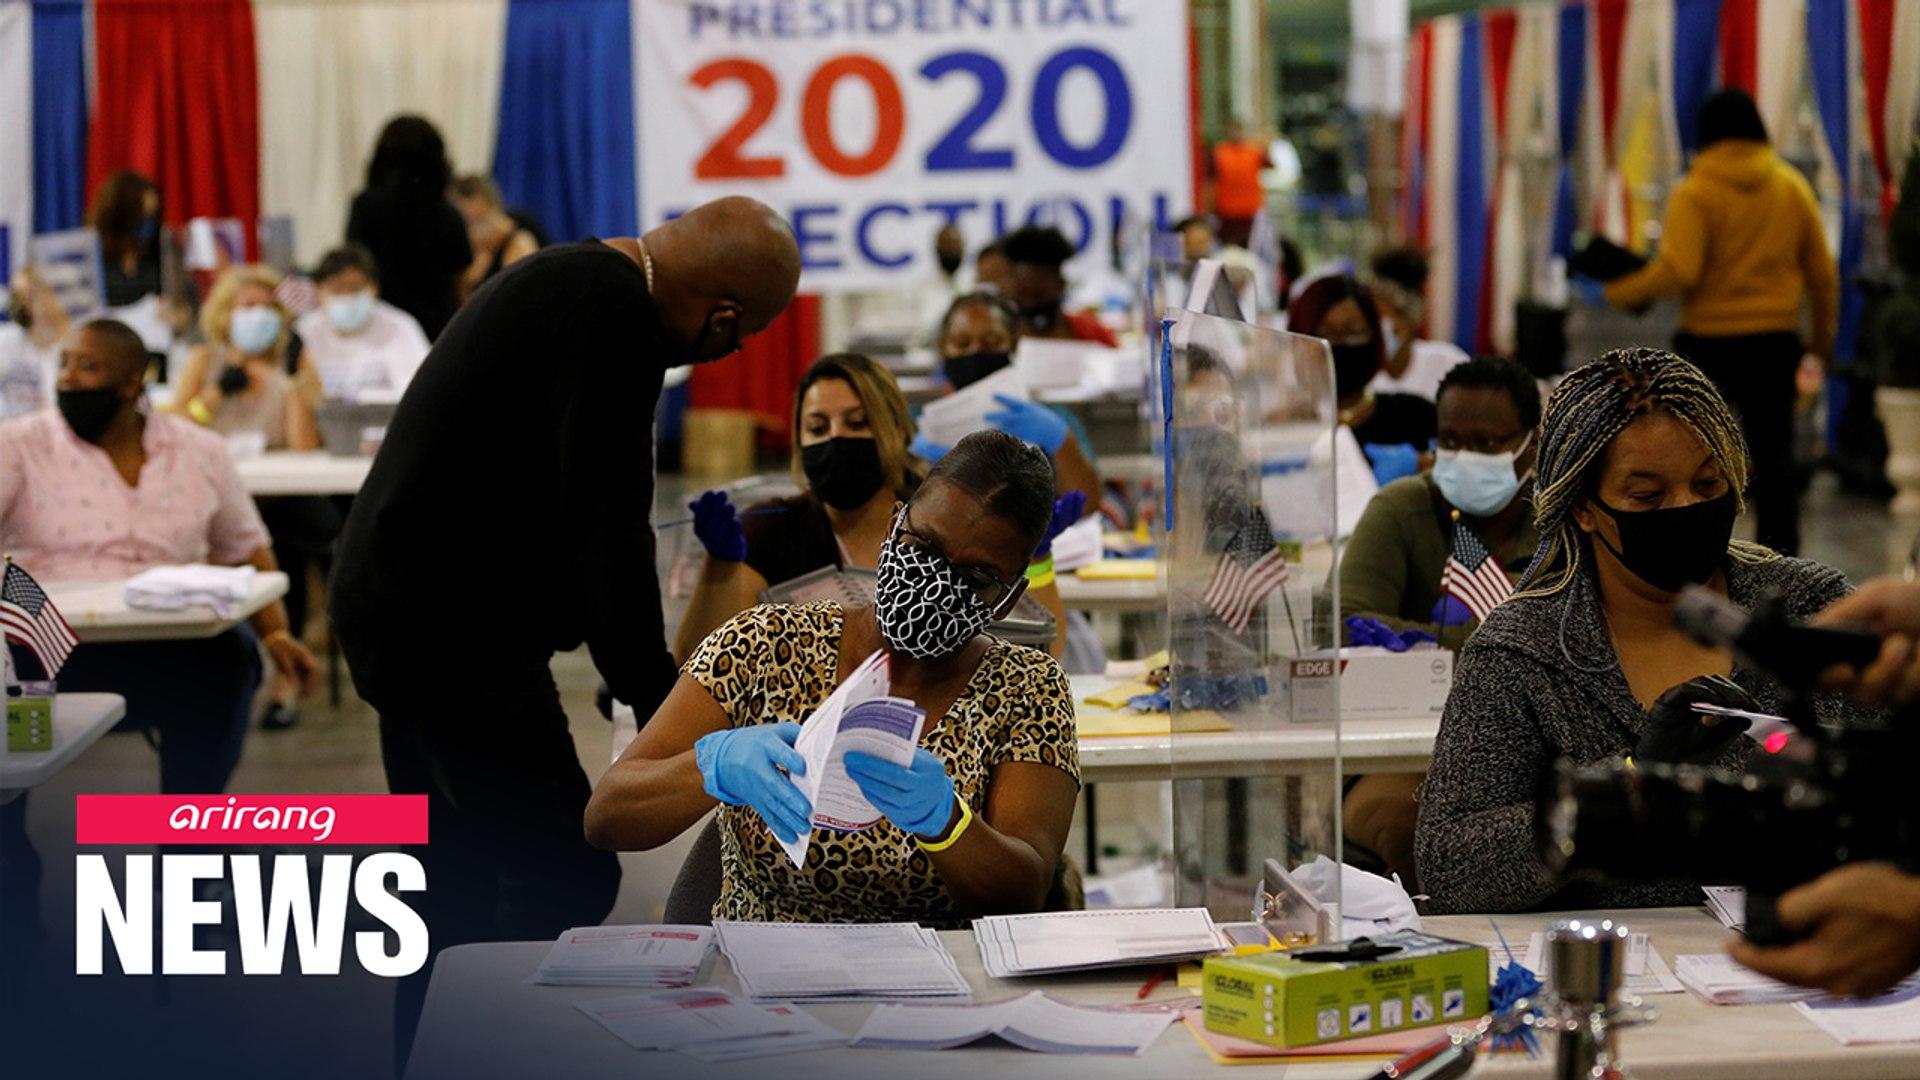 U.S. insight on 2020 election